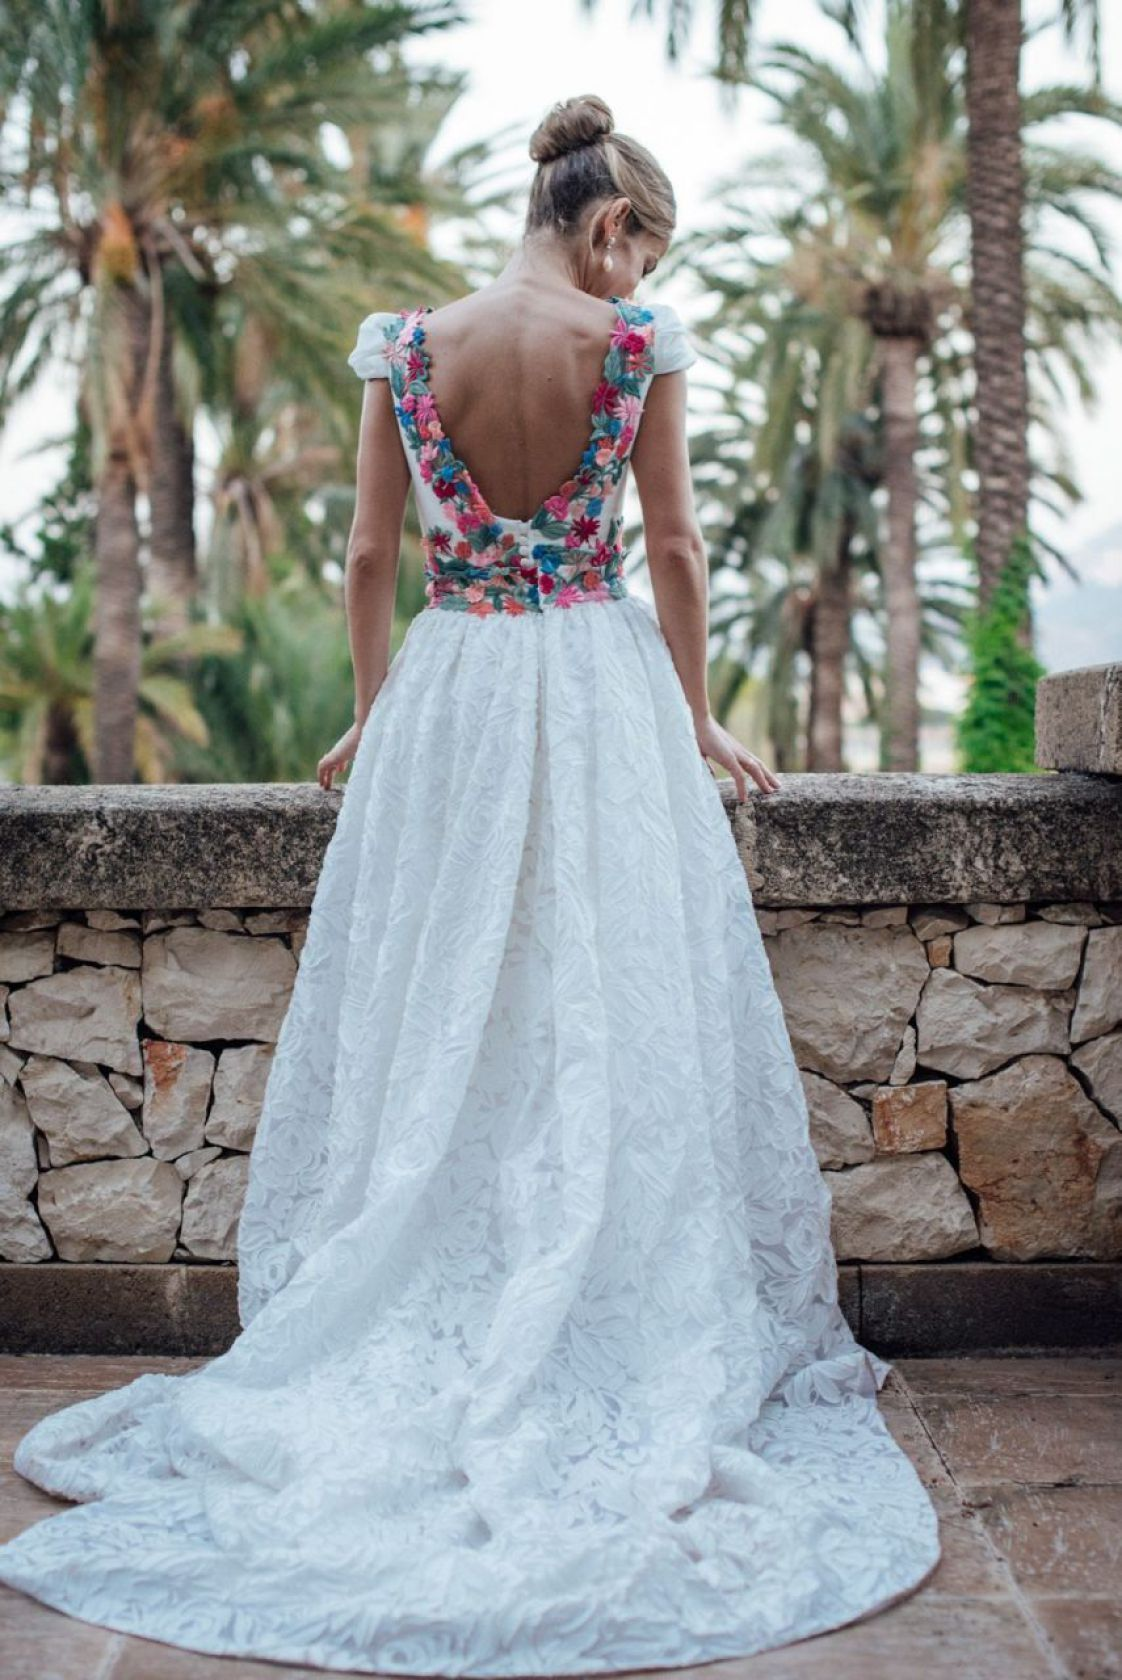 Vestidos estilo mexicano 1 detalles pinterest for Dresses for mexico wedding